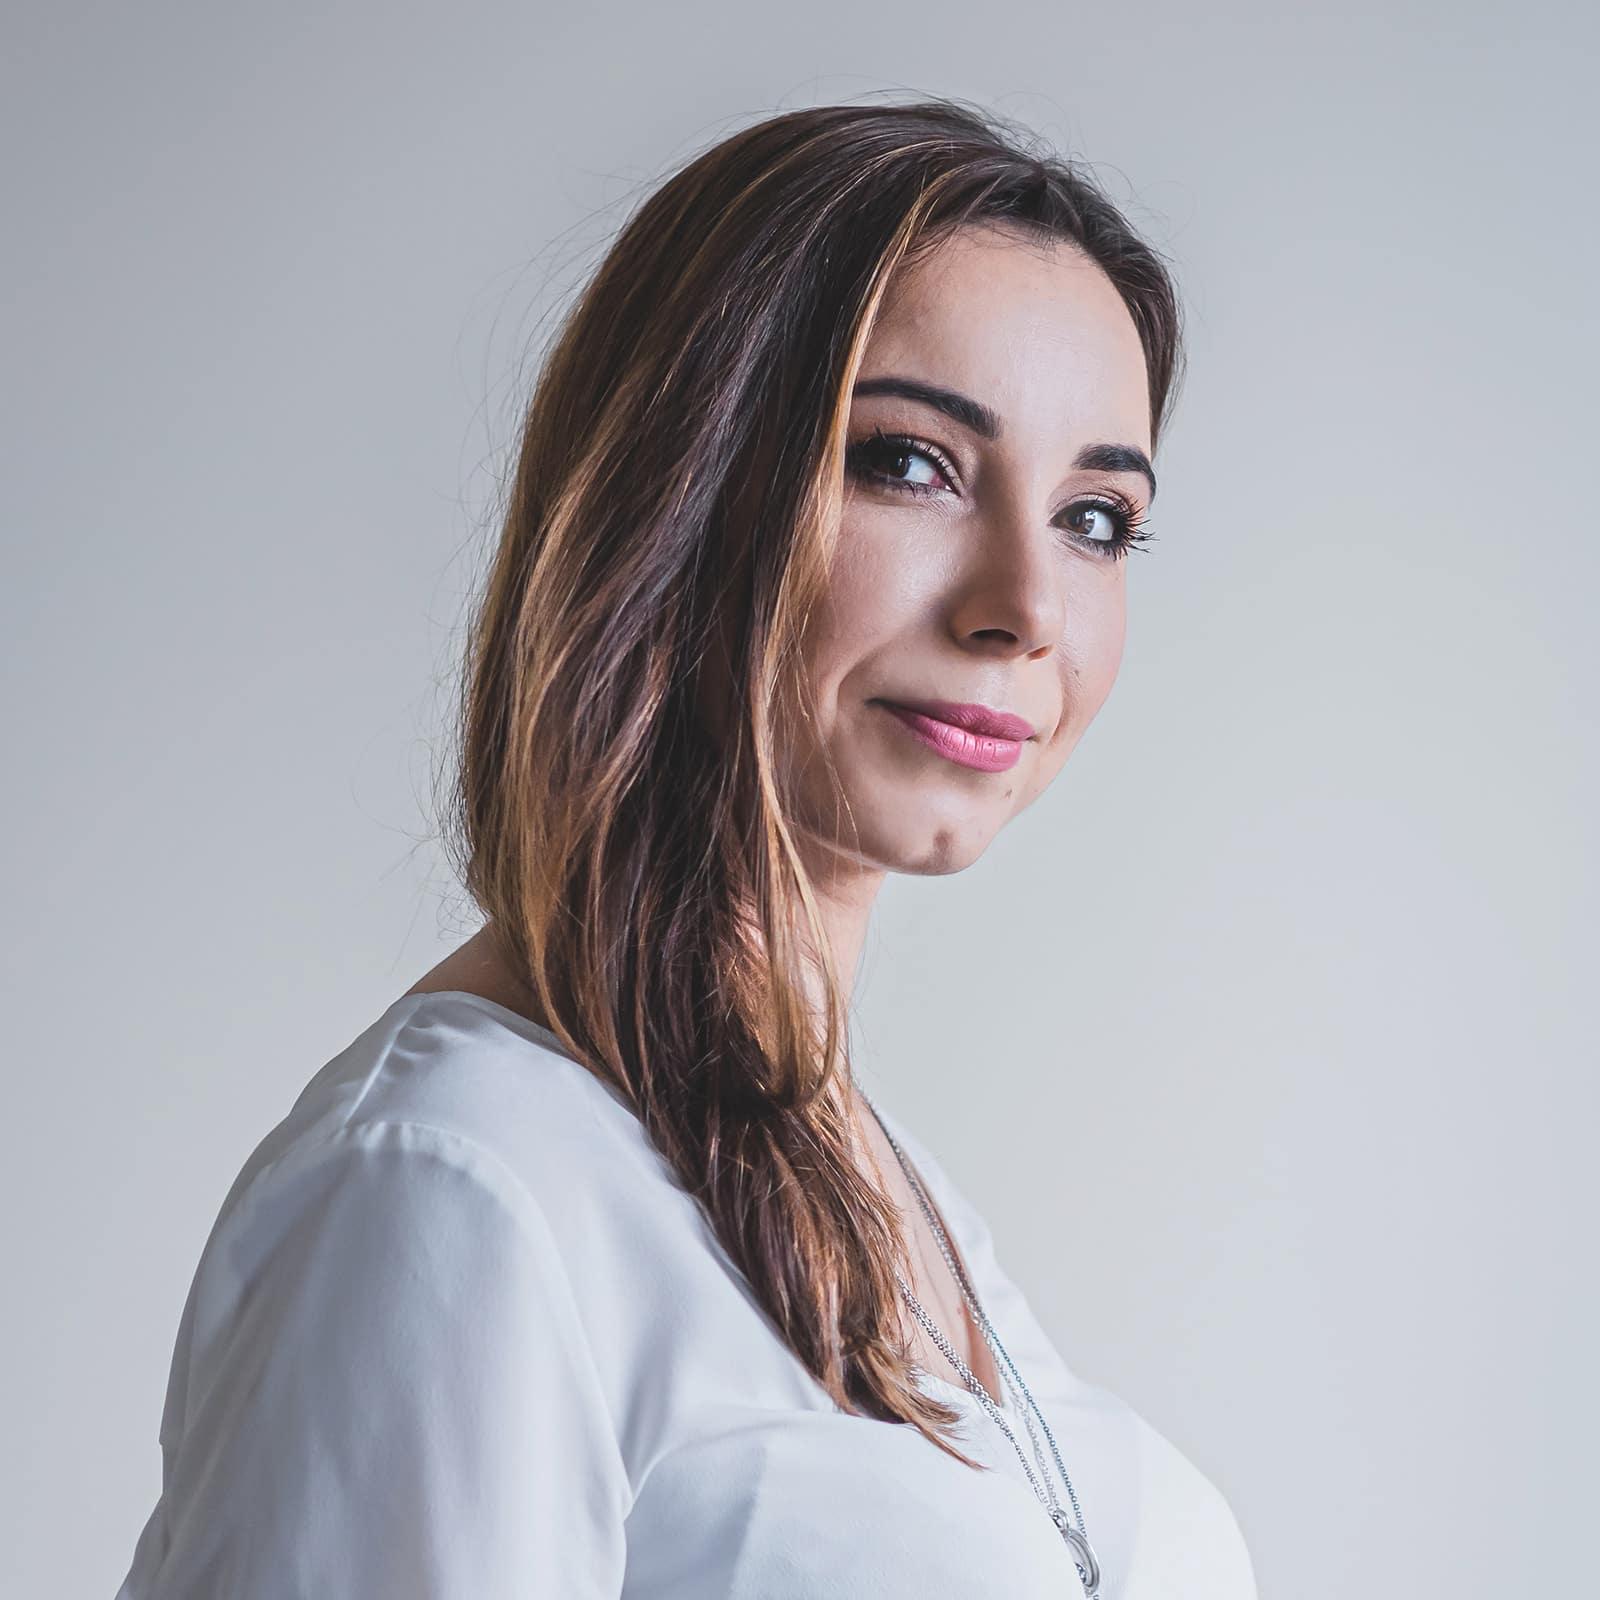 Zuzanna Drymer